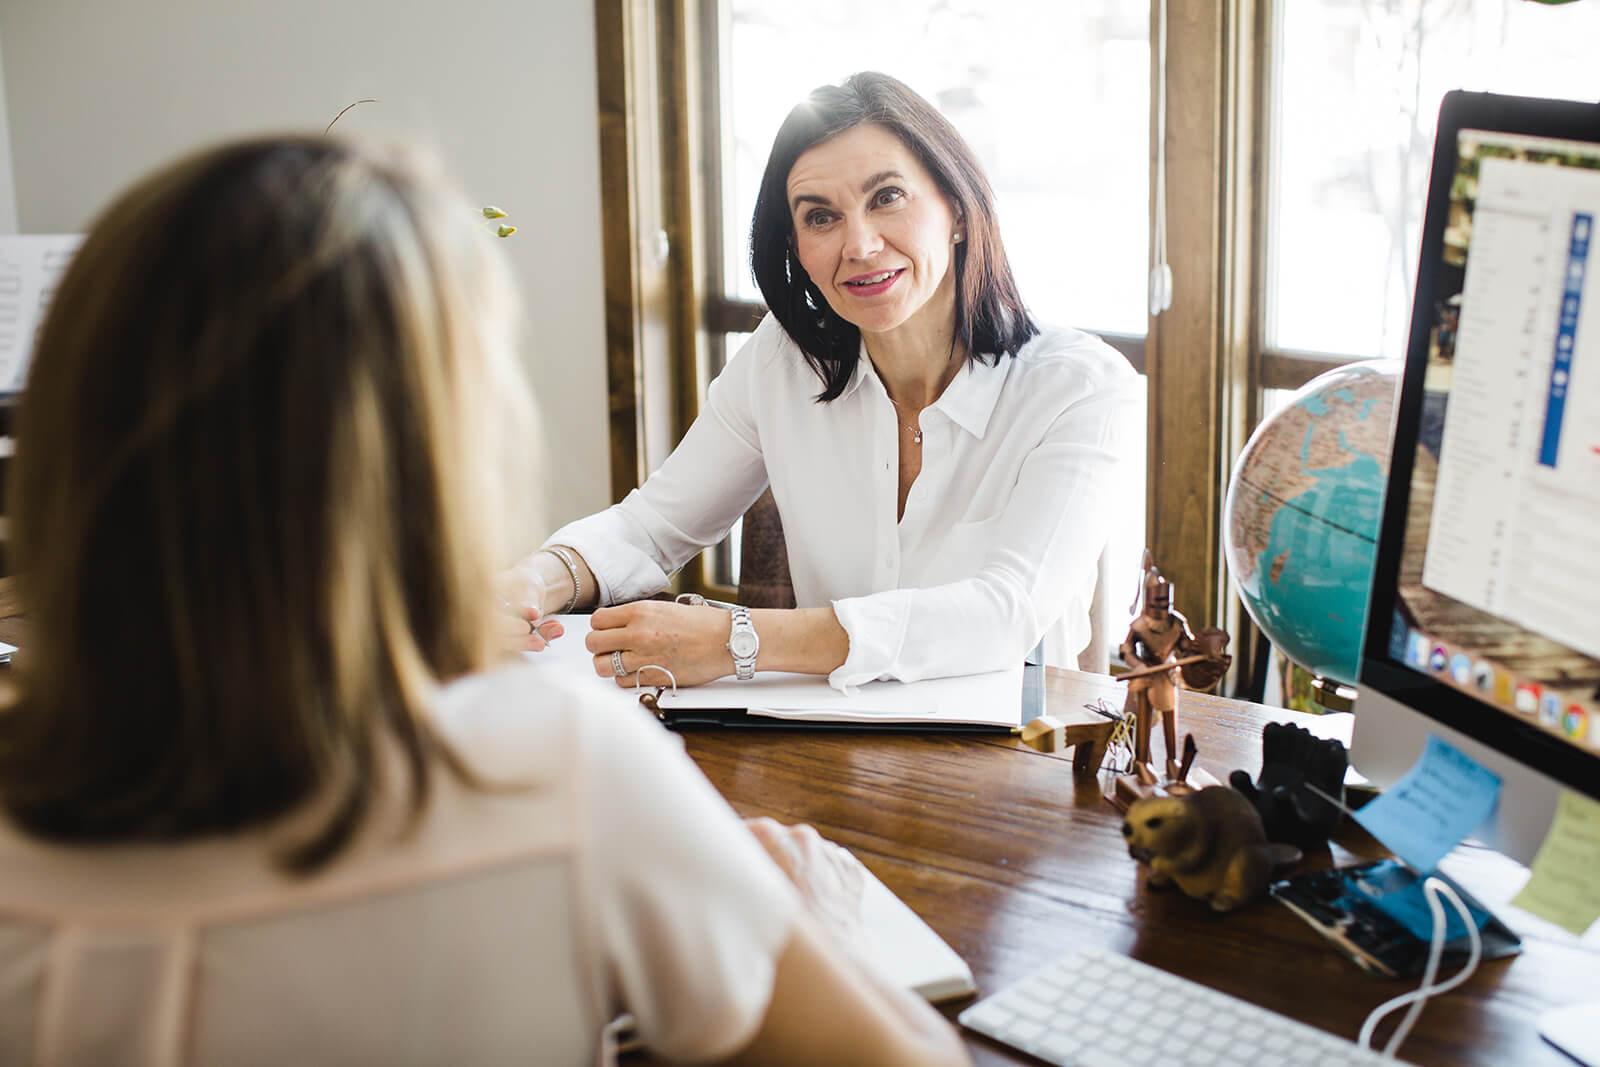 Having Real Conversations - D by denise - meetings